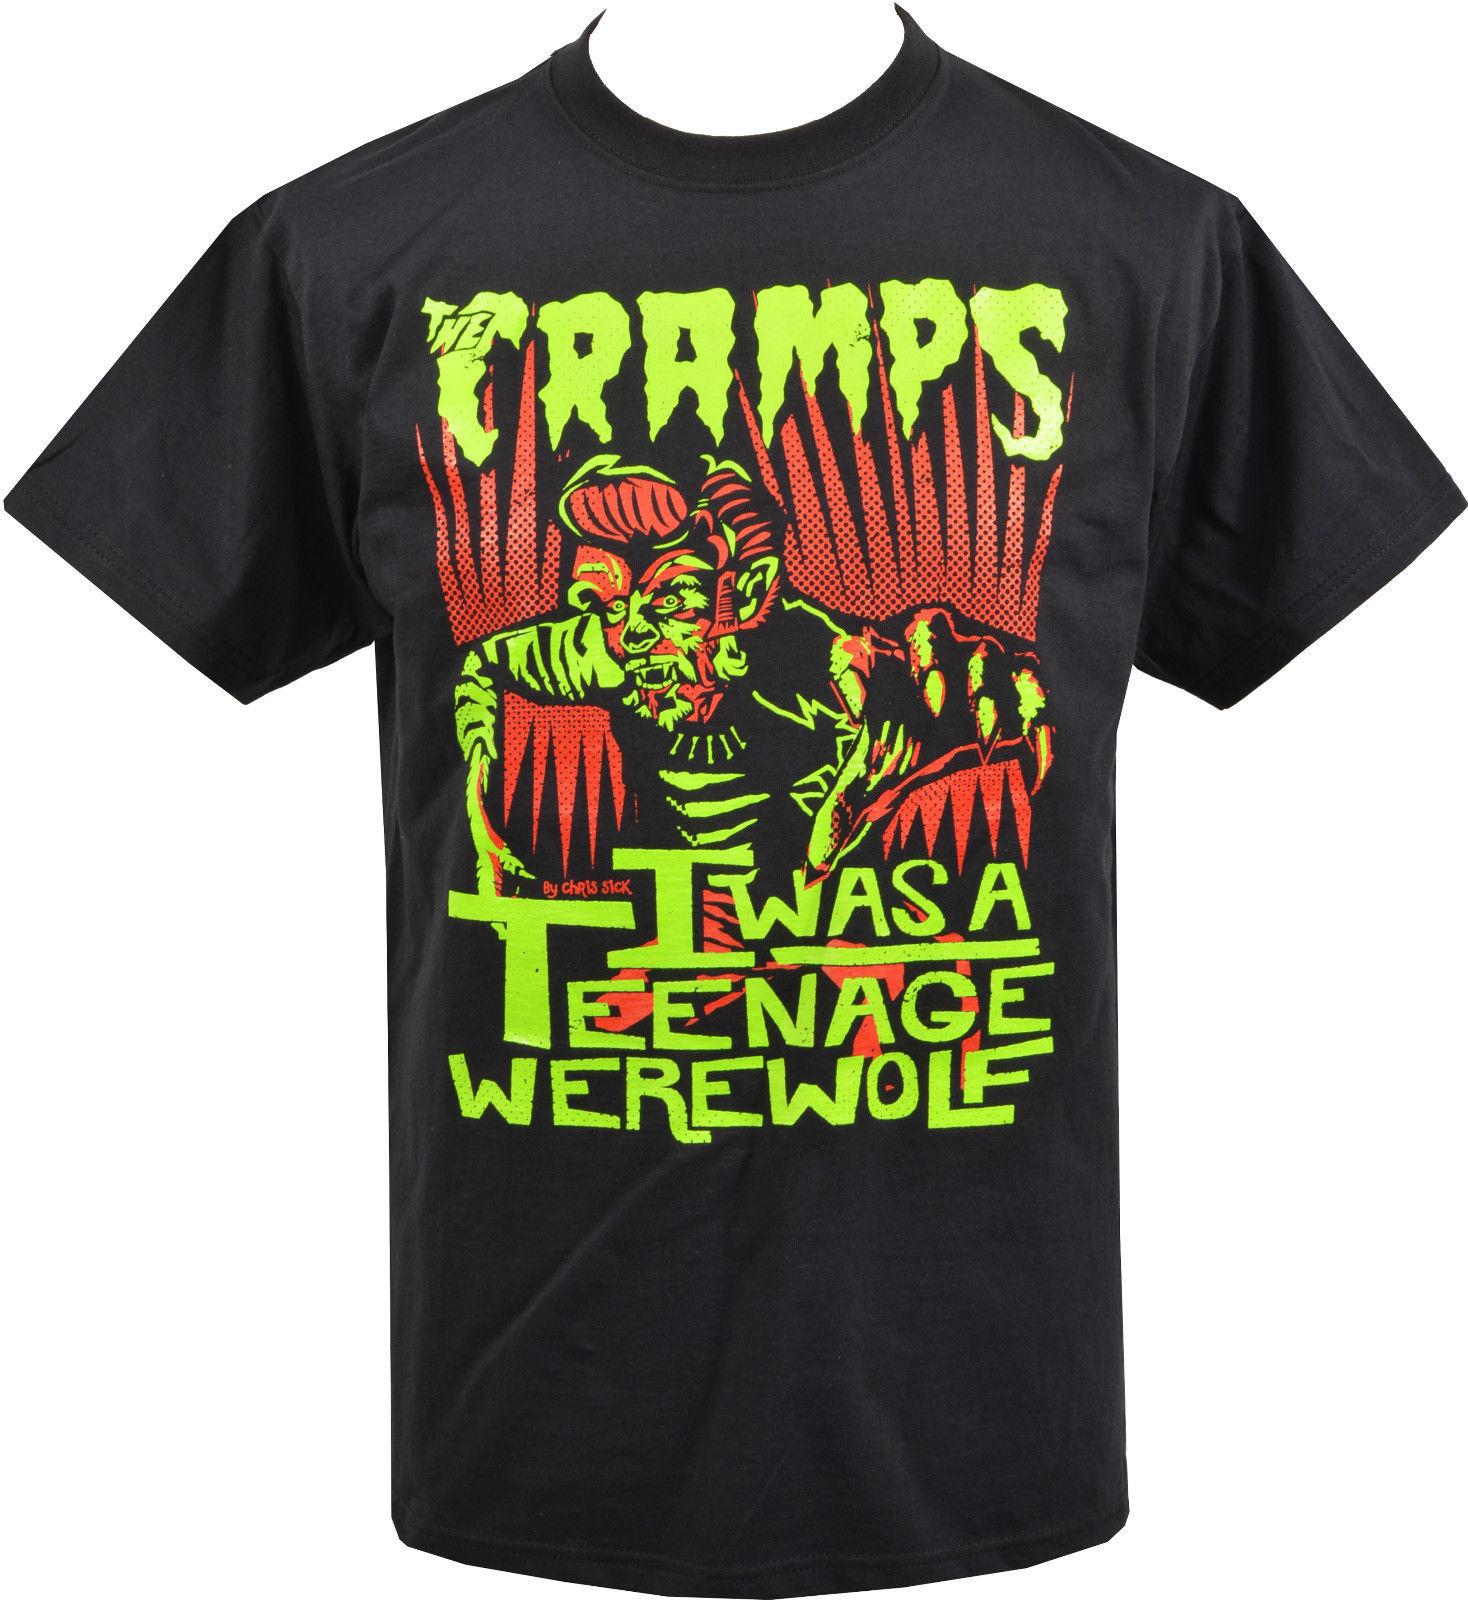 The Cramps T Shirts Graphic Printed Short Sleeve Man T-Shirts Black